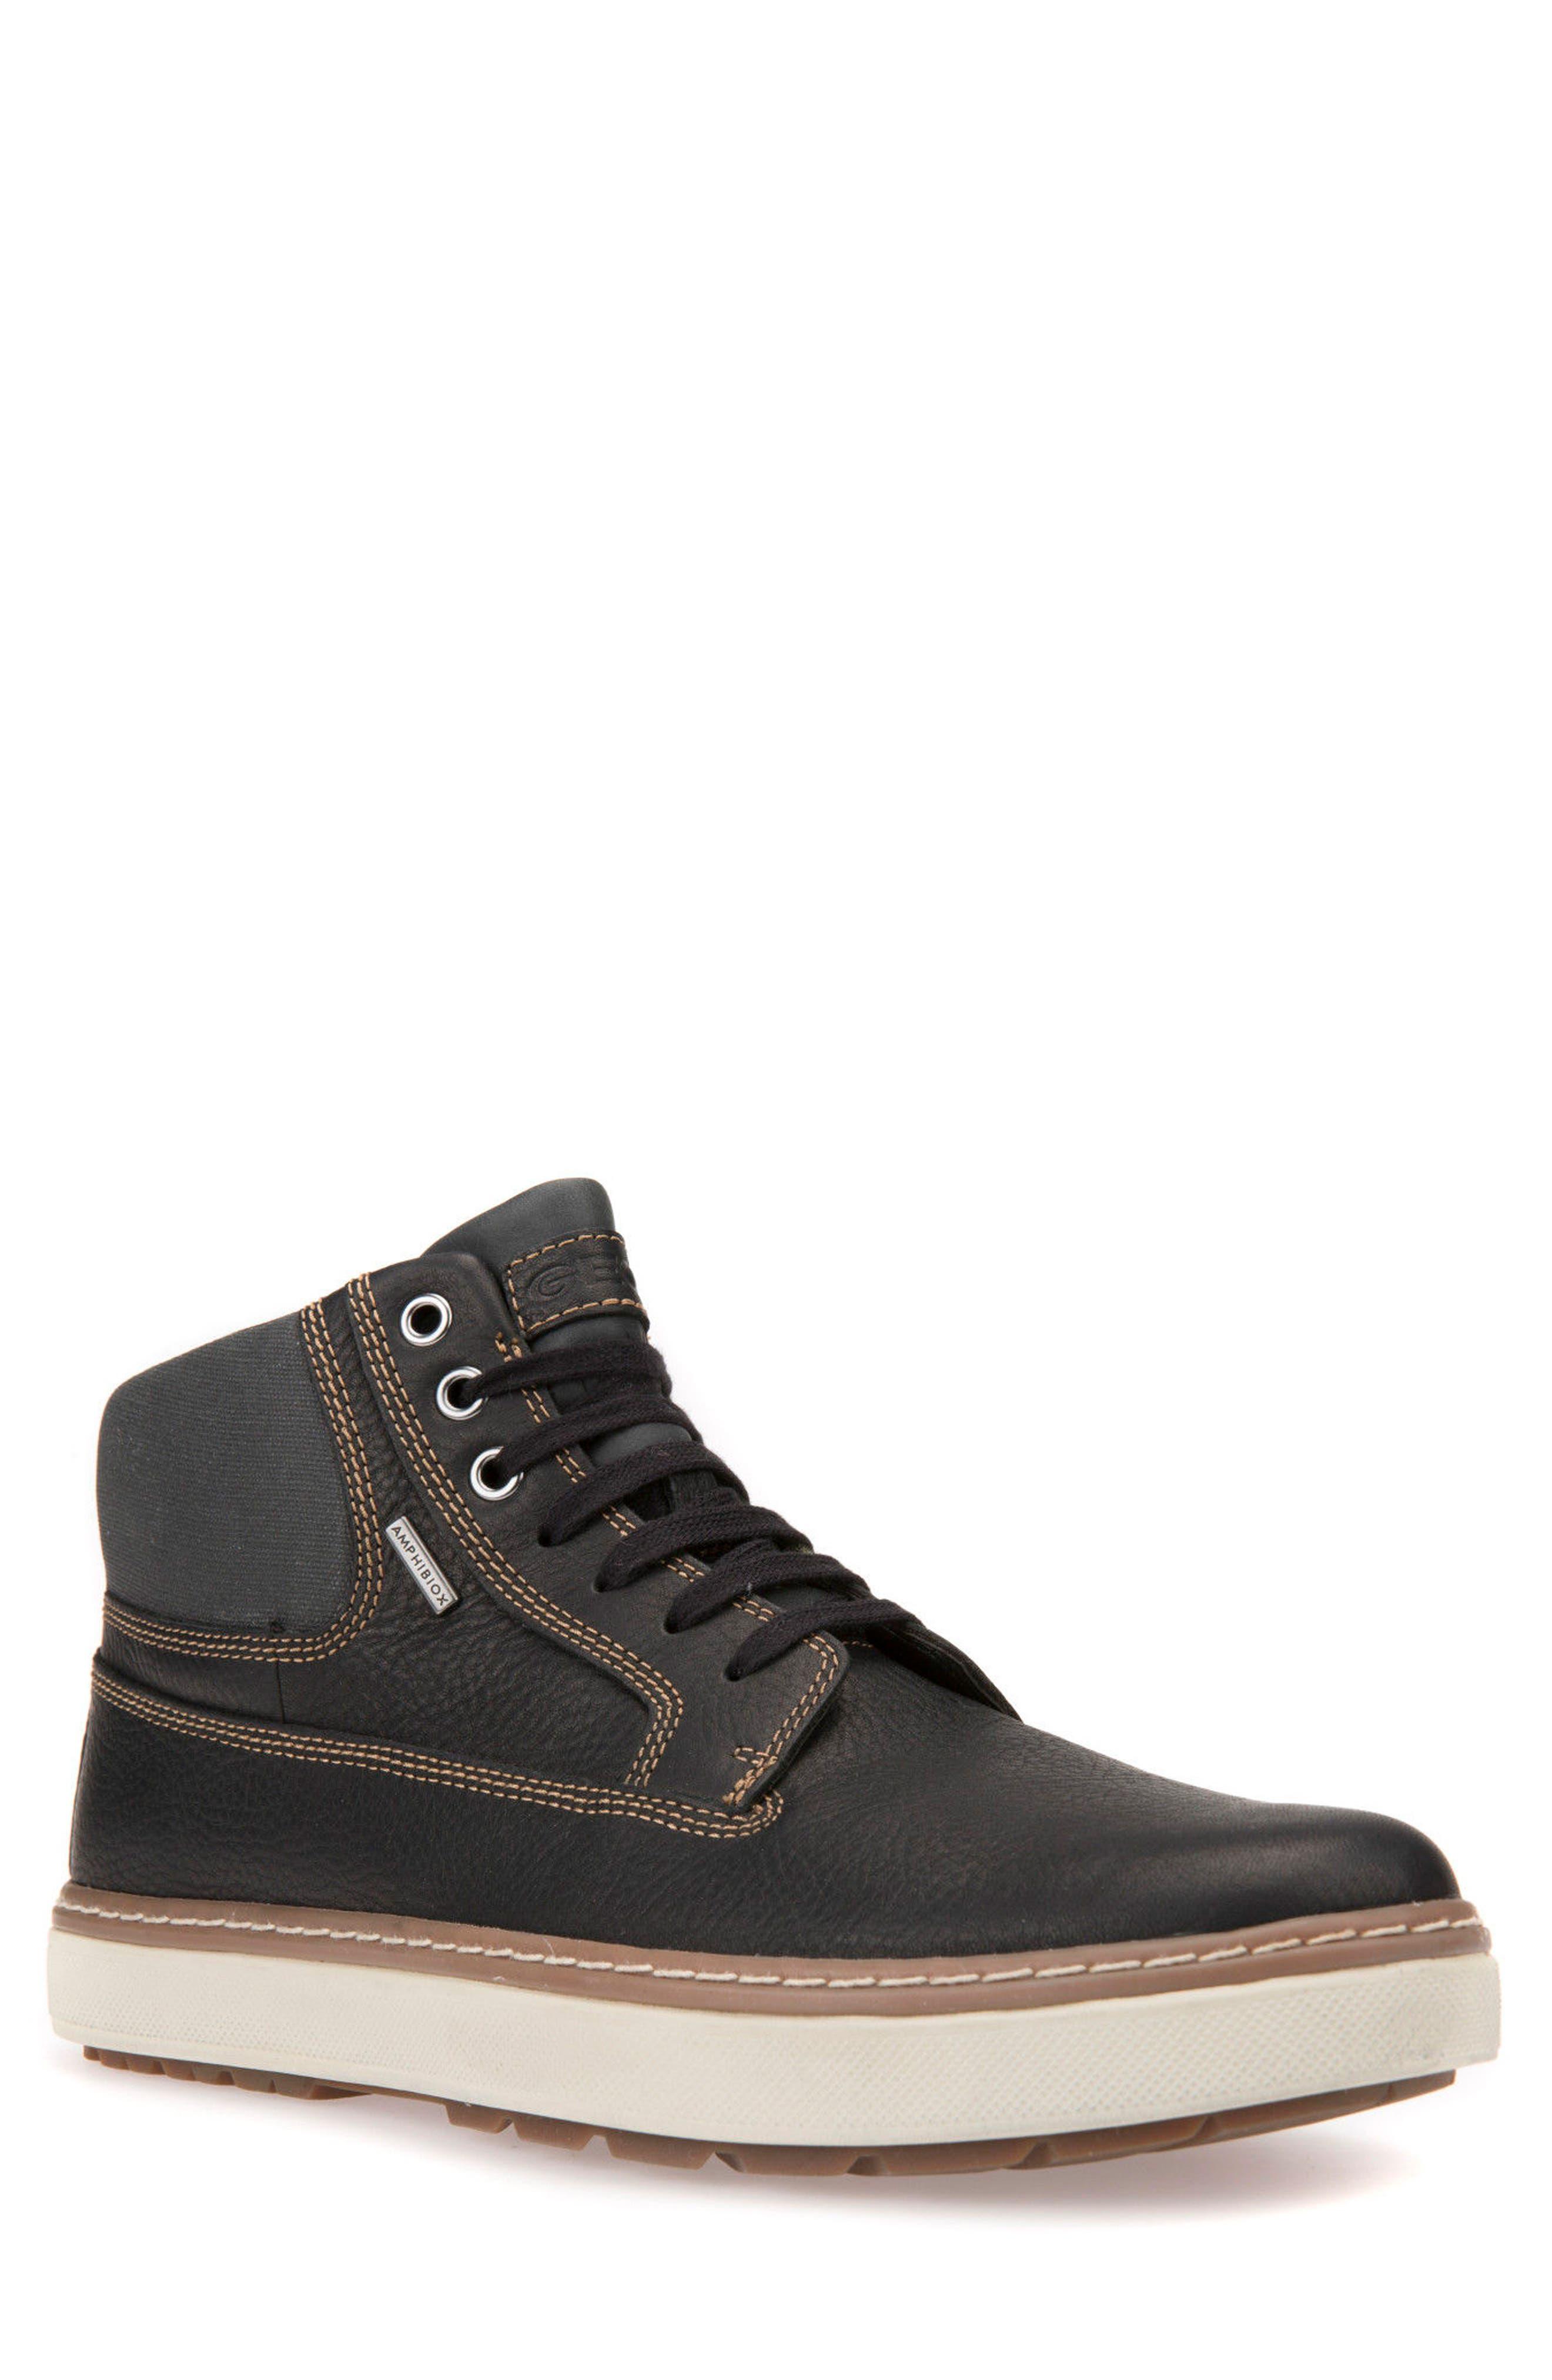 Geox Mattias B ABX Waterproof Sneaker Boot (Men)